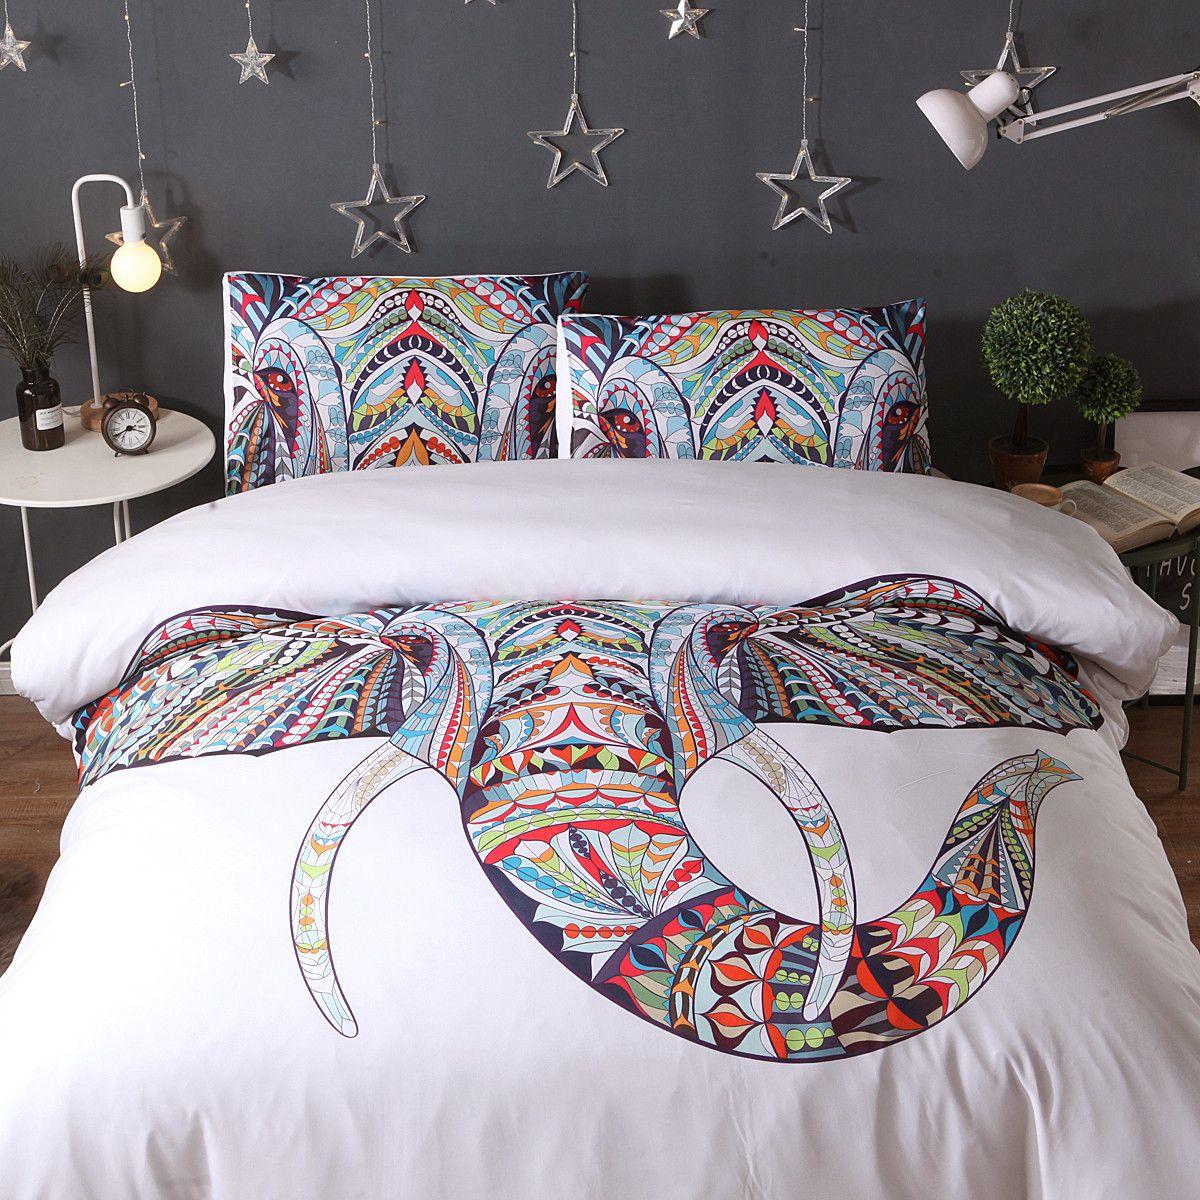 Tribal Elephant Bedding Set 3pcs duvet cover and pillow case Indian God Ganesha 200*200 /228 * 228 / 230*260 Outlets